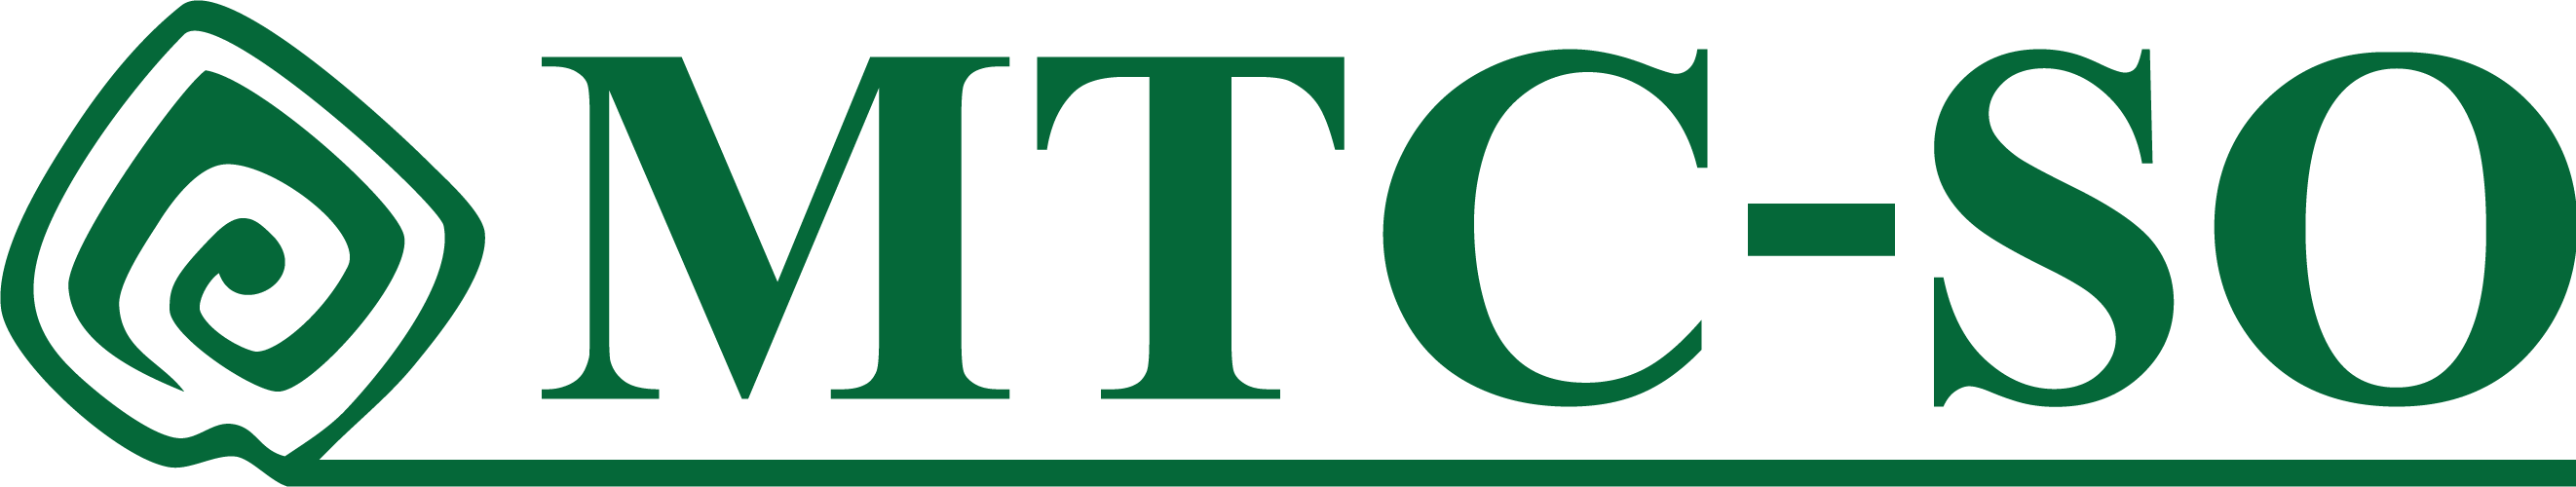 MTC-SO Logo